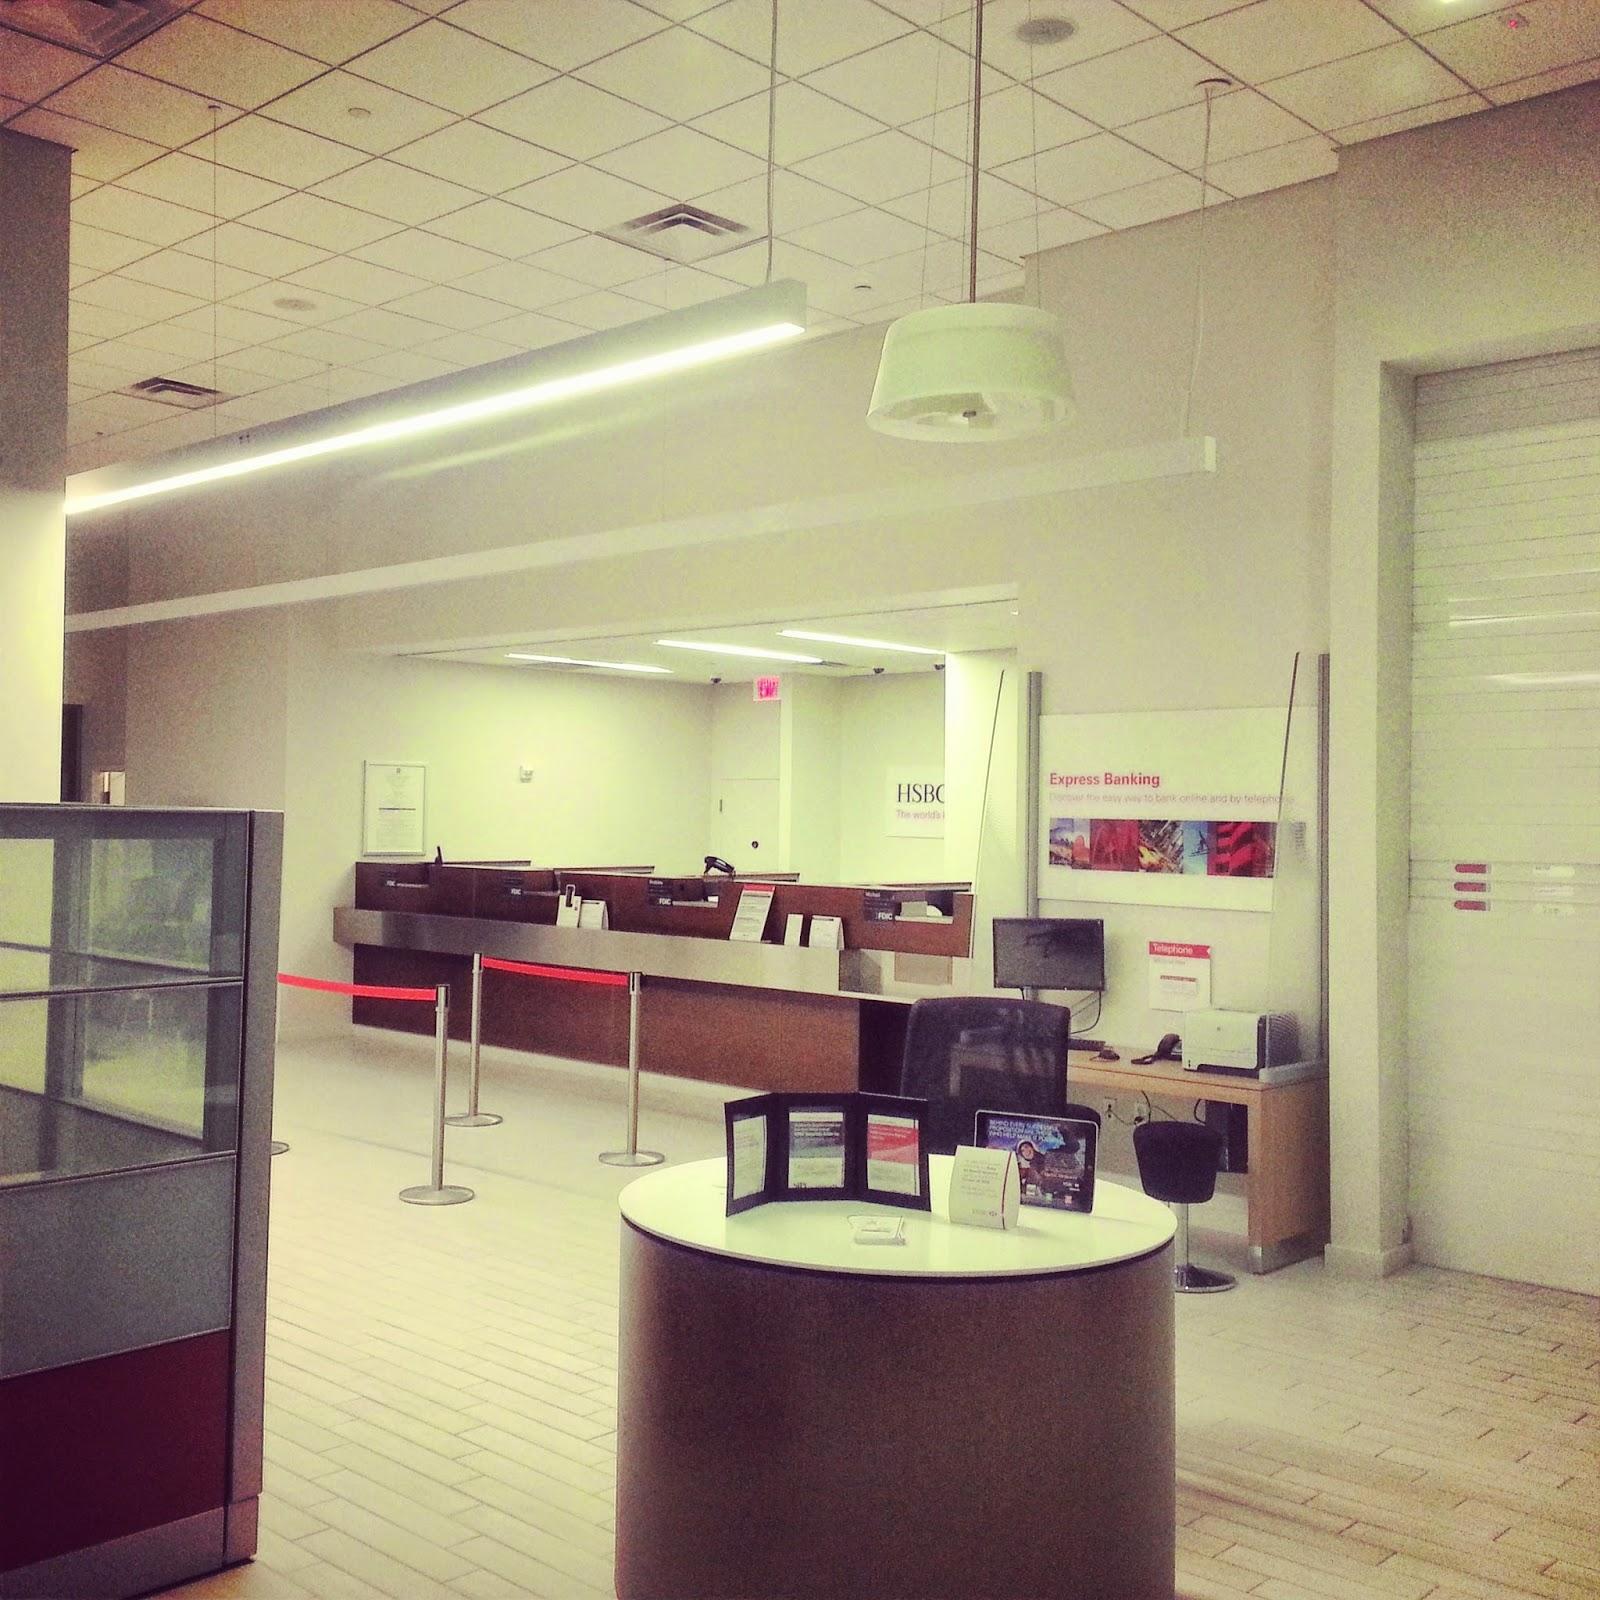 Robert Dyer @ Bethesda Row: HSBC BANK ELIMINATING SATURDAY HOURS IN